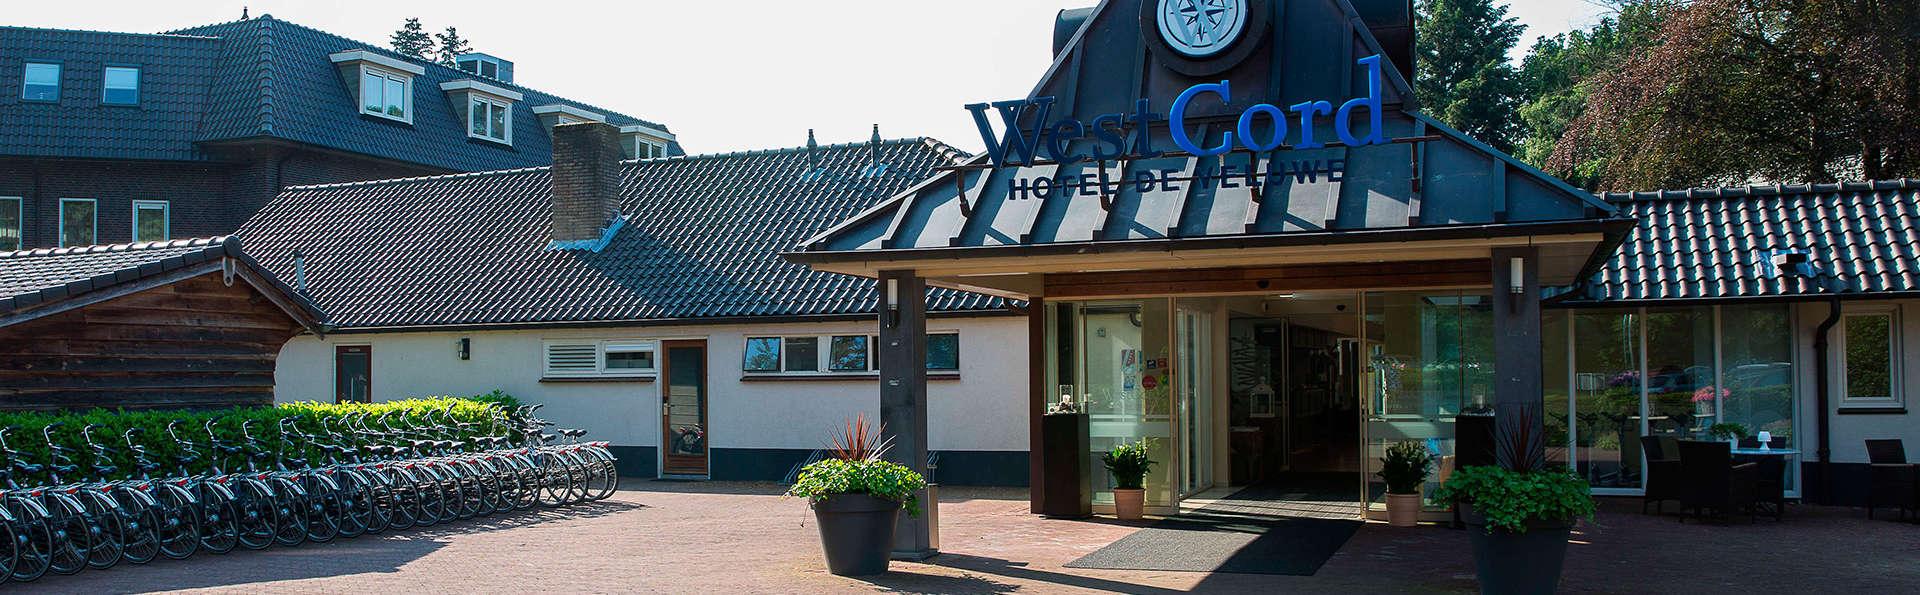 WestCord hotel de Veluwe - EDIT_front1.jpg